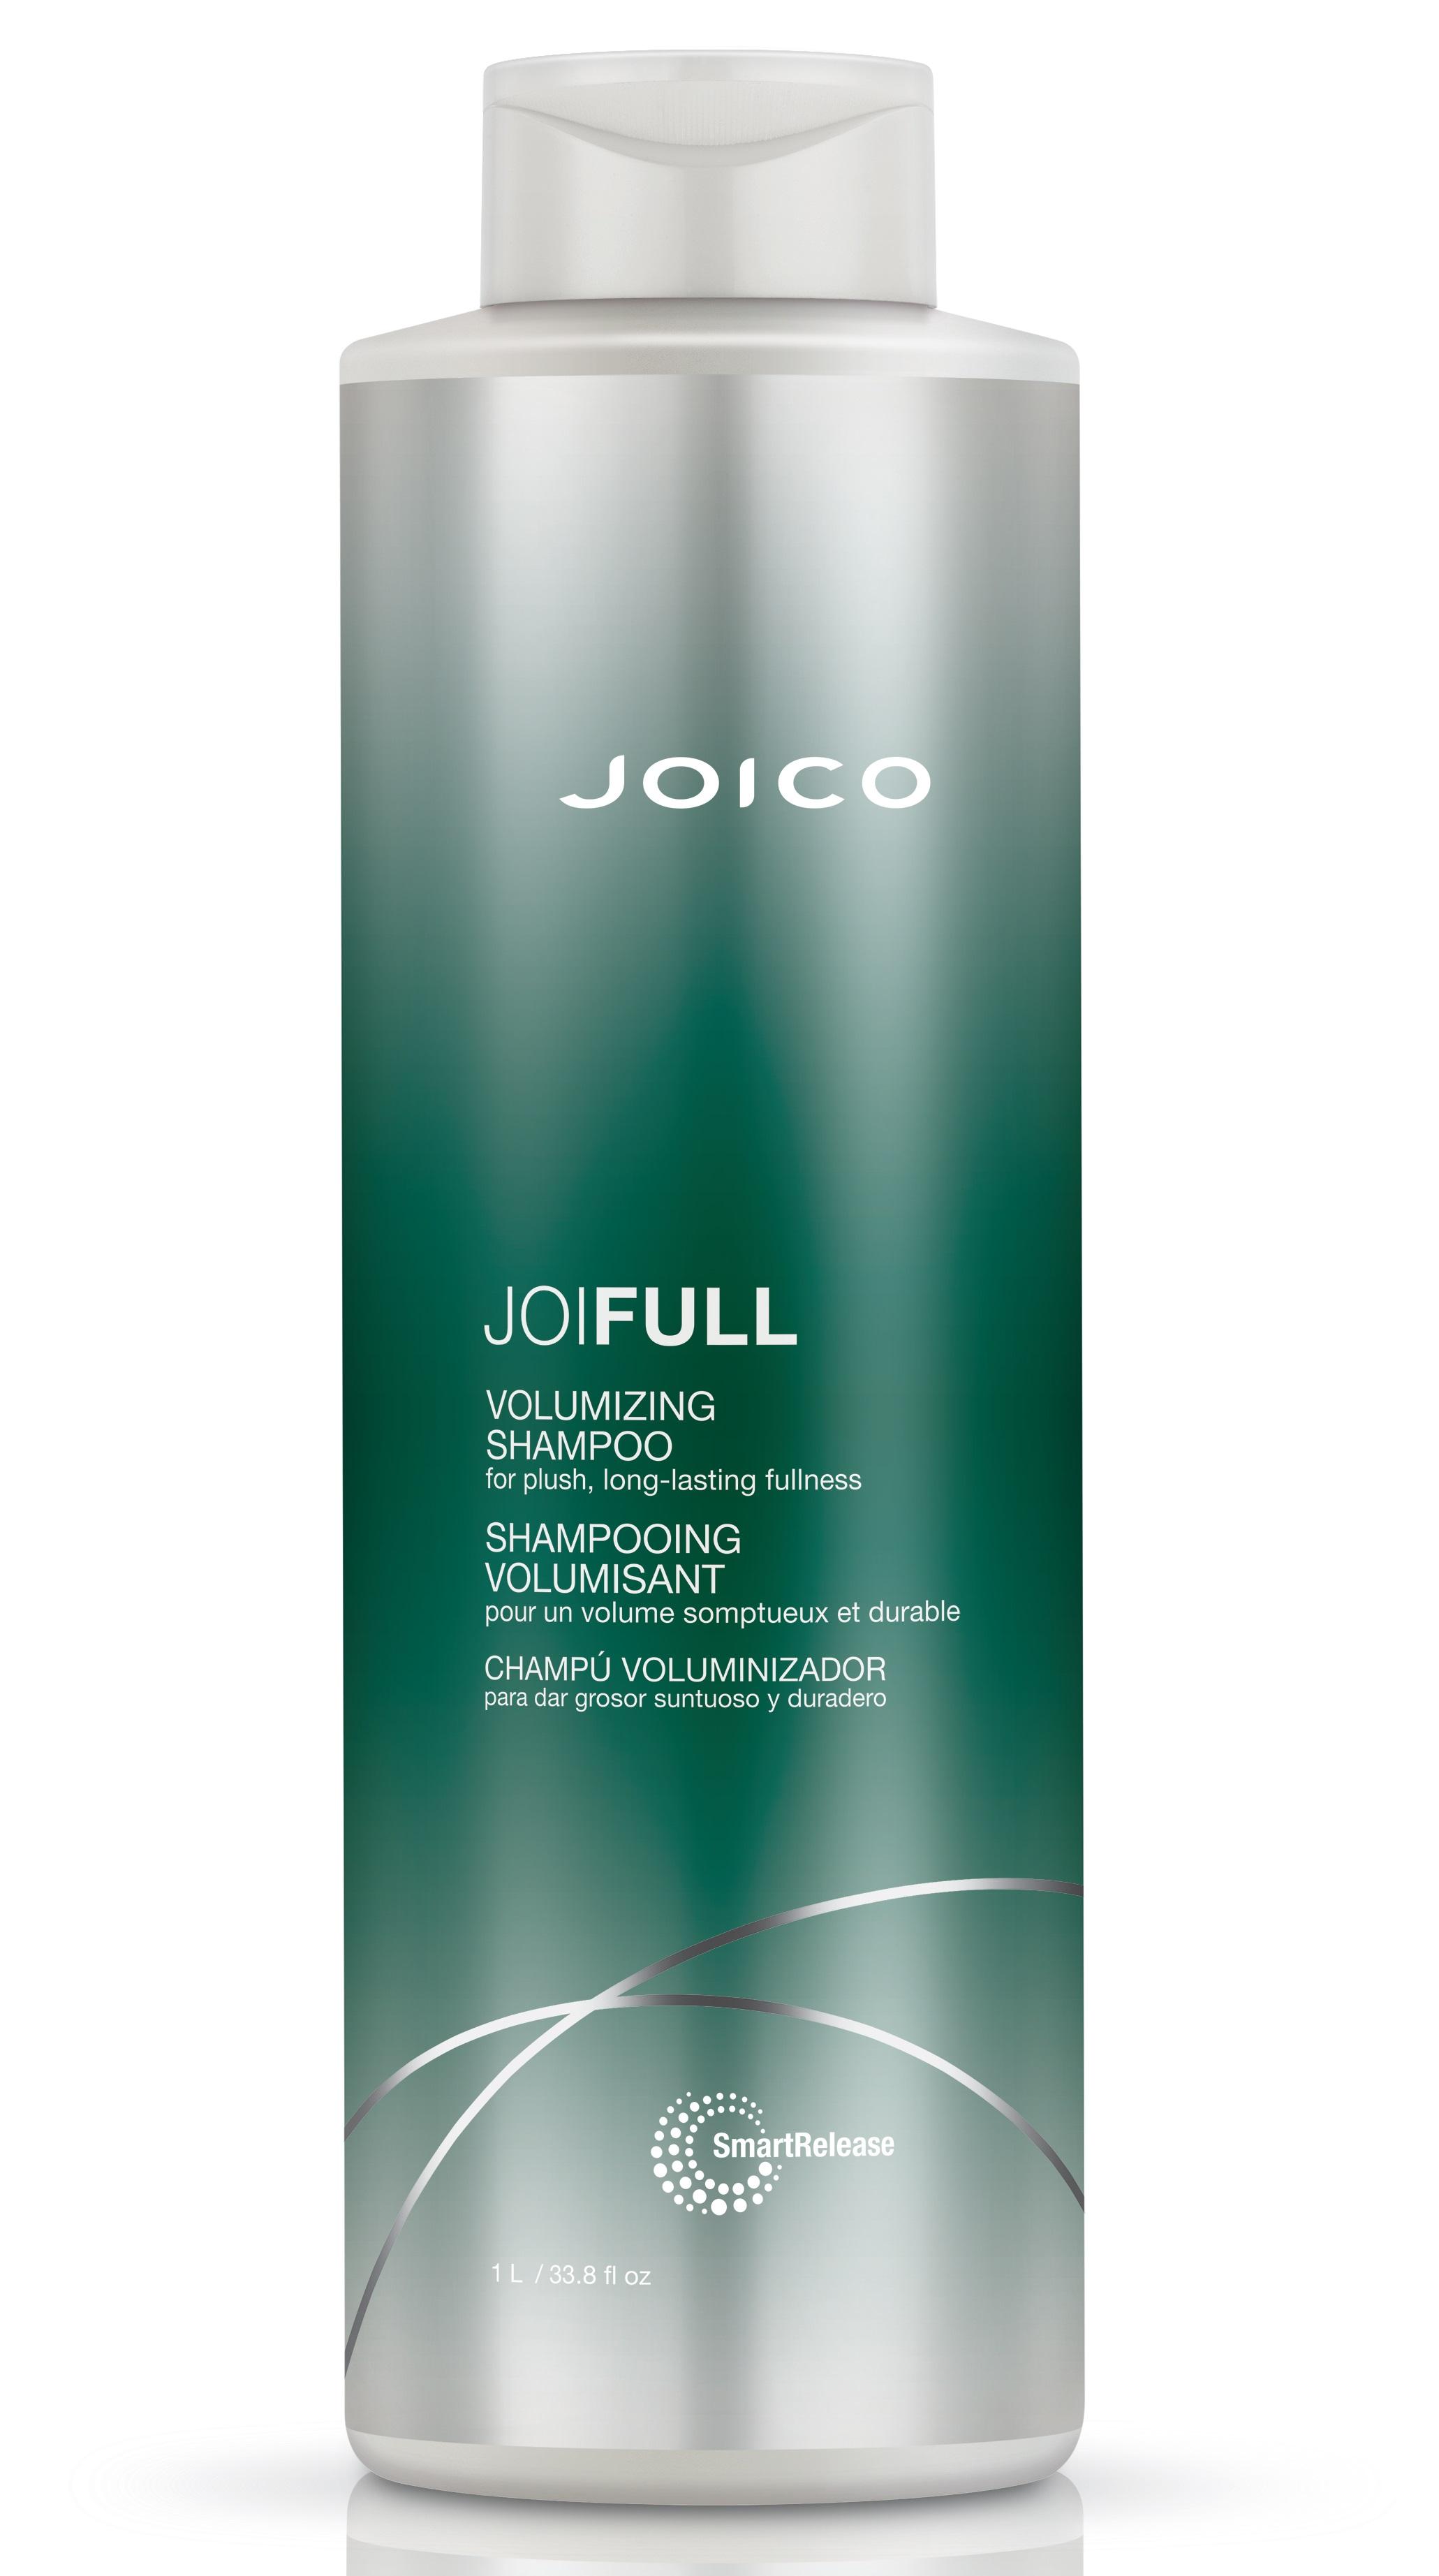 JOICO Шампунь для воздушного объема волос / JoiFull Volumizing Shampoo 1000 мл.